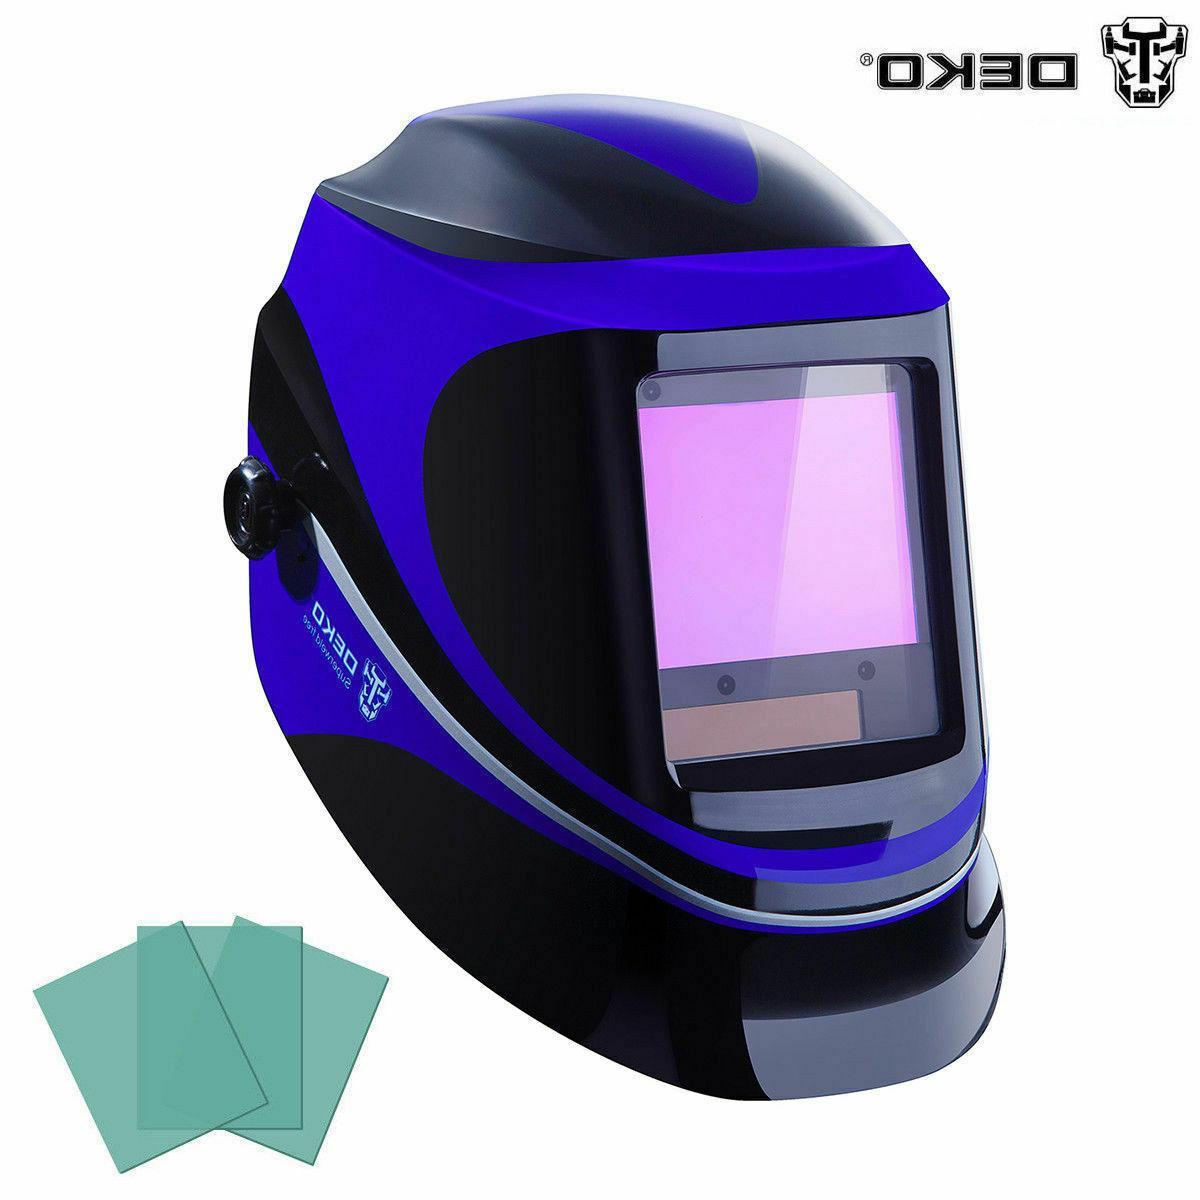 DEKO Pro Solar Auto Darkening MIG MMA Electric Welding Mask